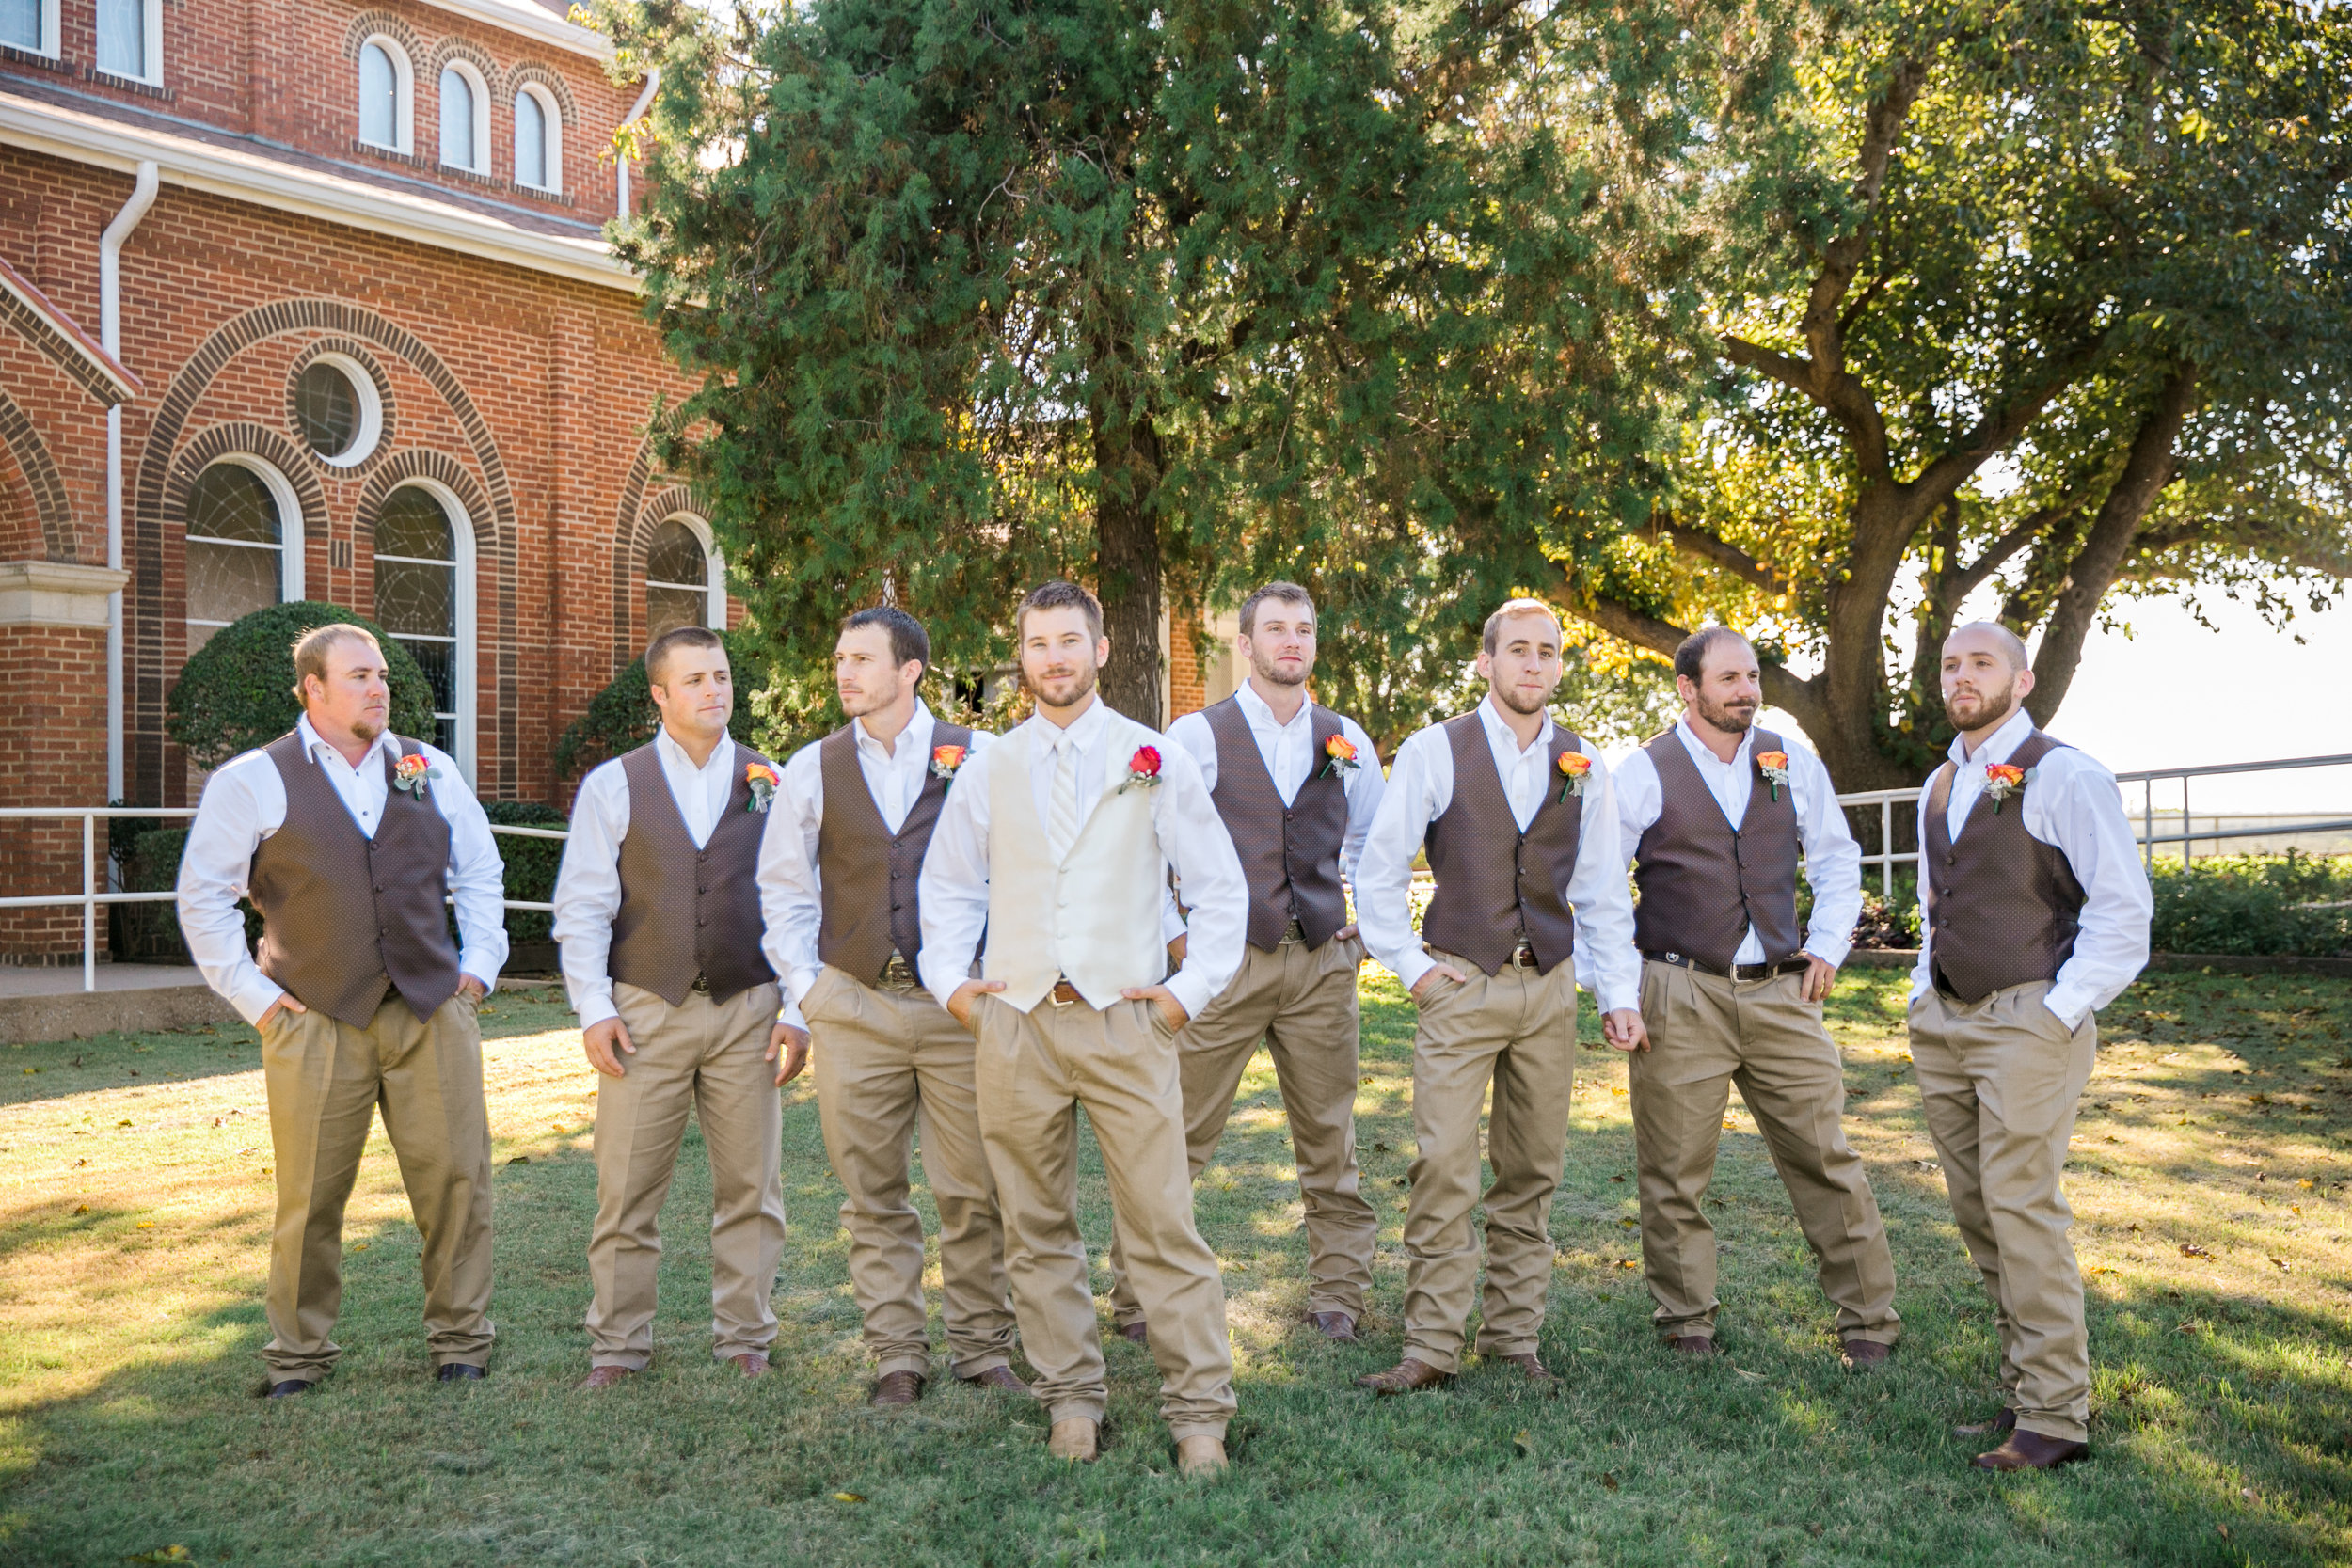 Bailey-Nathan-Windthorst-Texas-Wedding-028.jpg